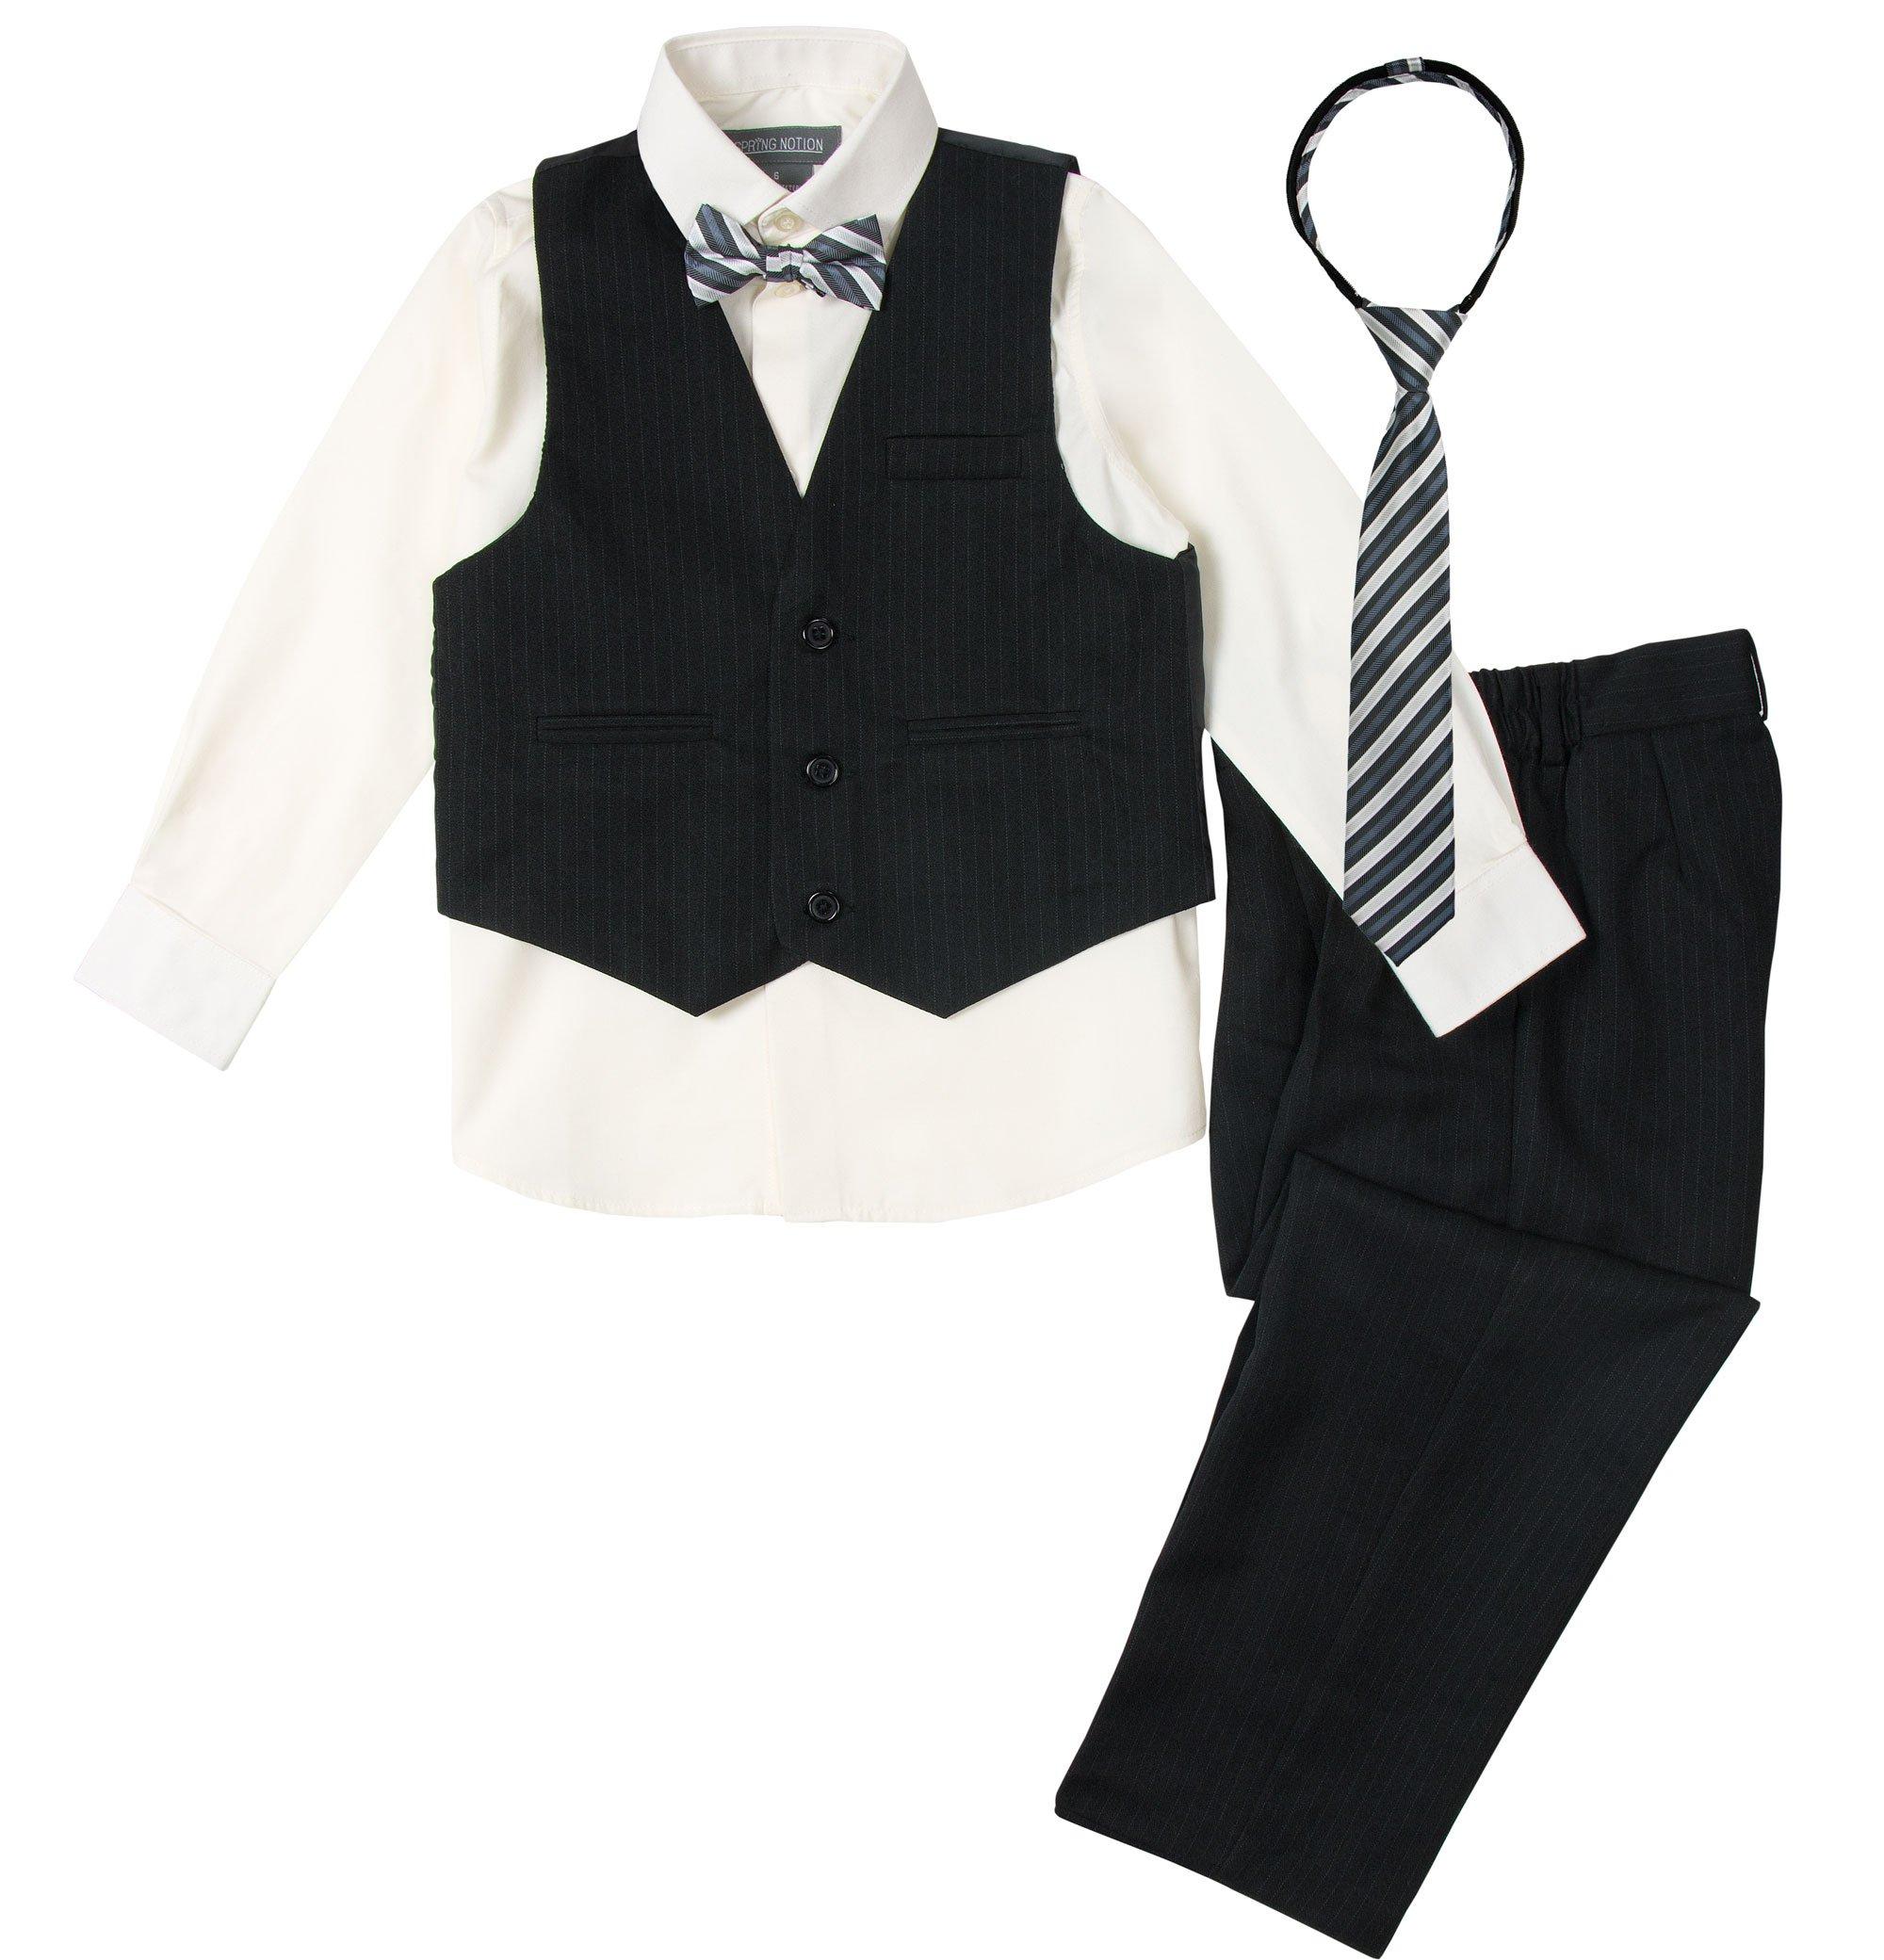 Spring Notion Big Boys' 5 Piece Pinstripe Vest Set Black-Ivory-B 5